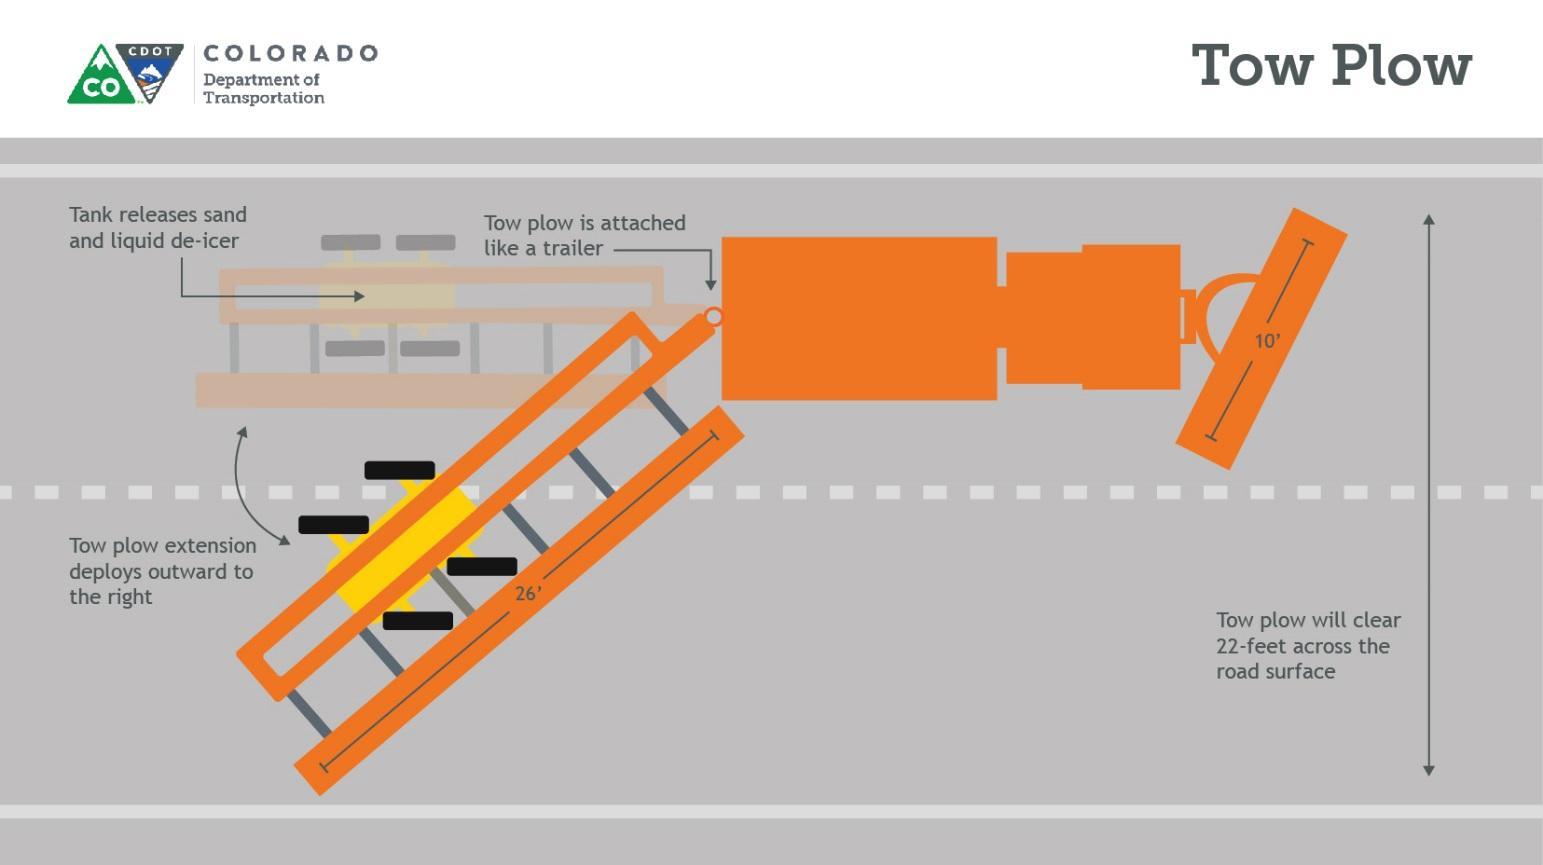 Tow Plow.jpg detail image